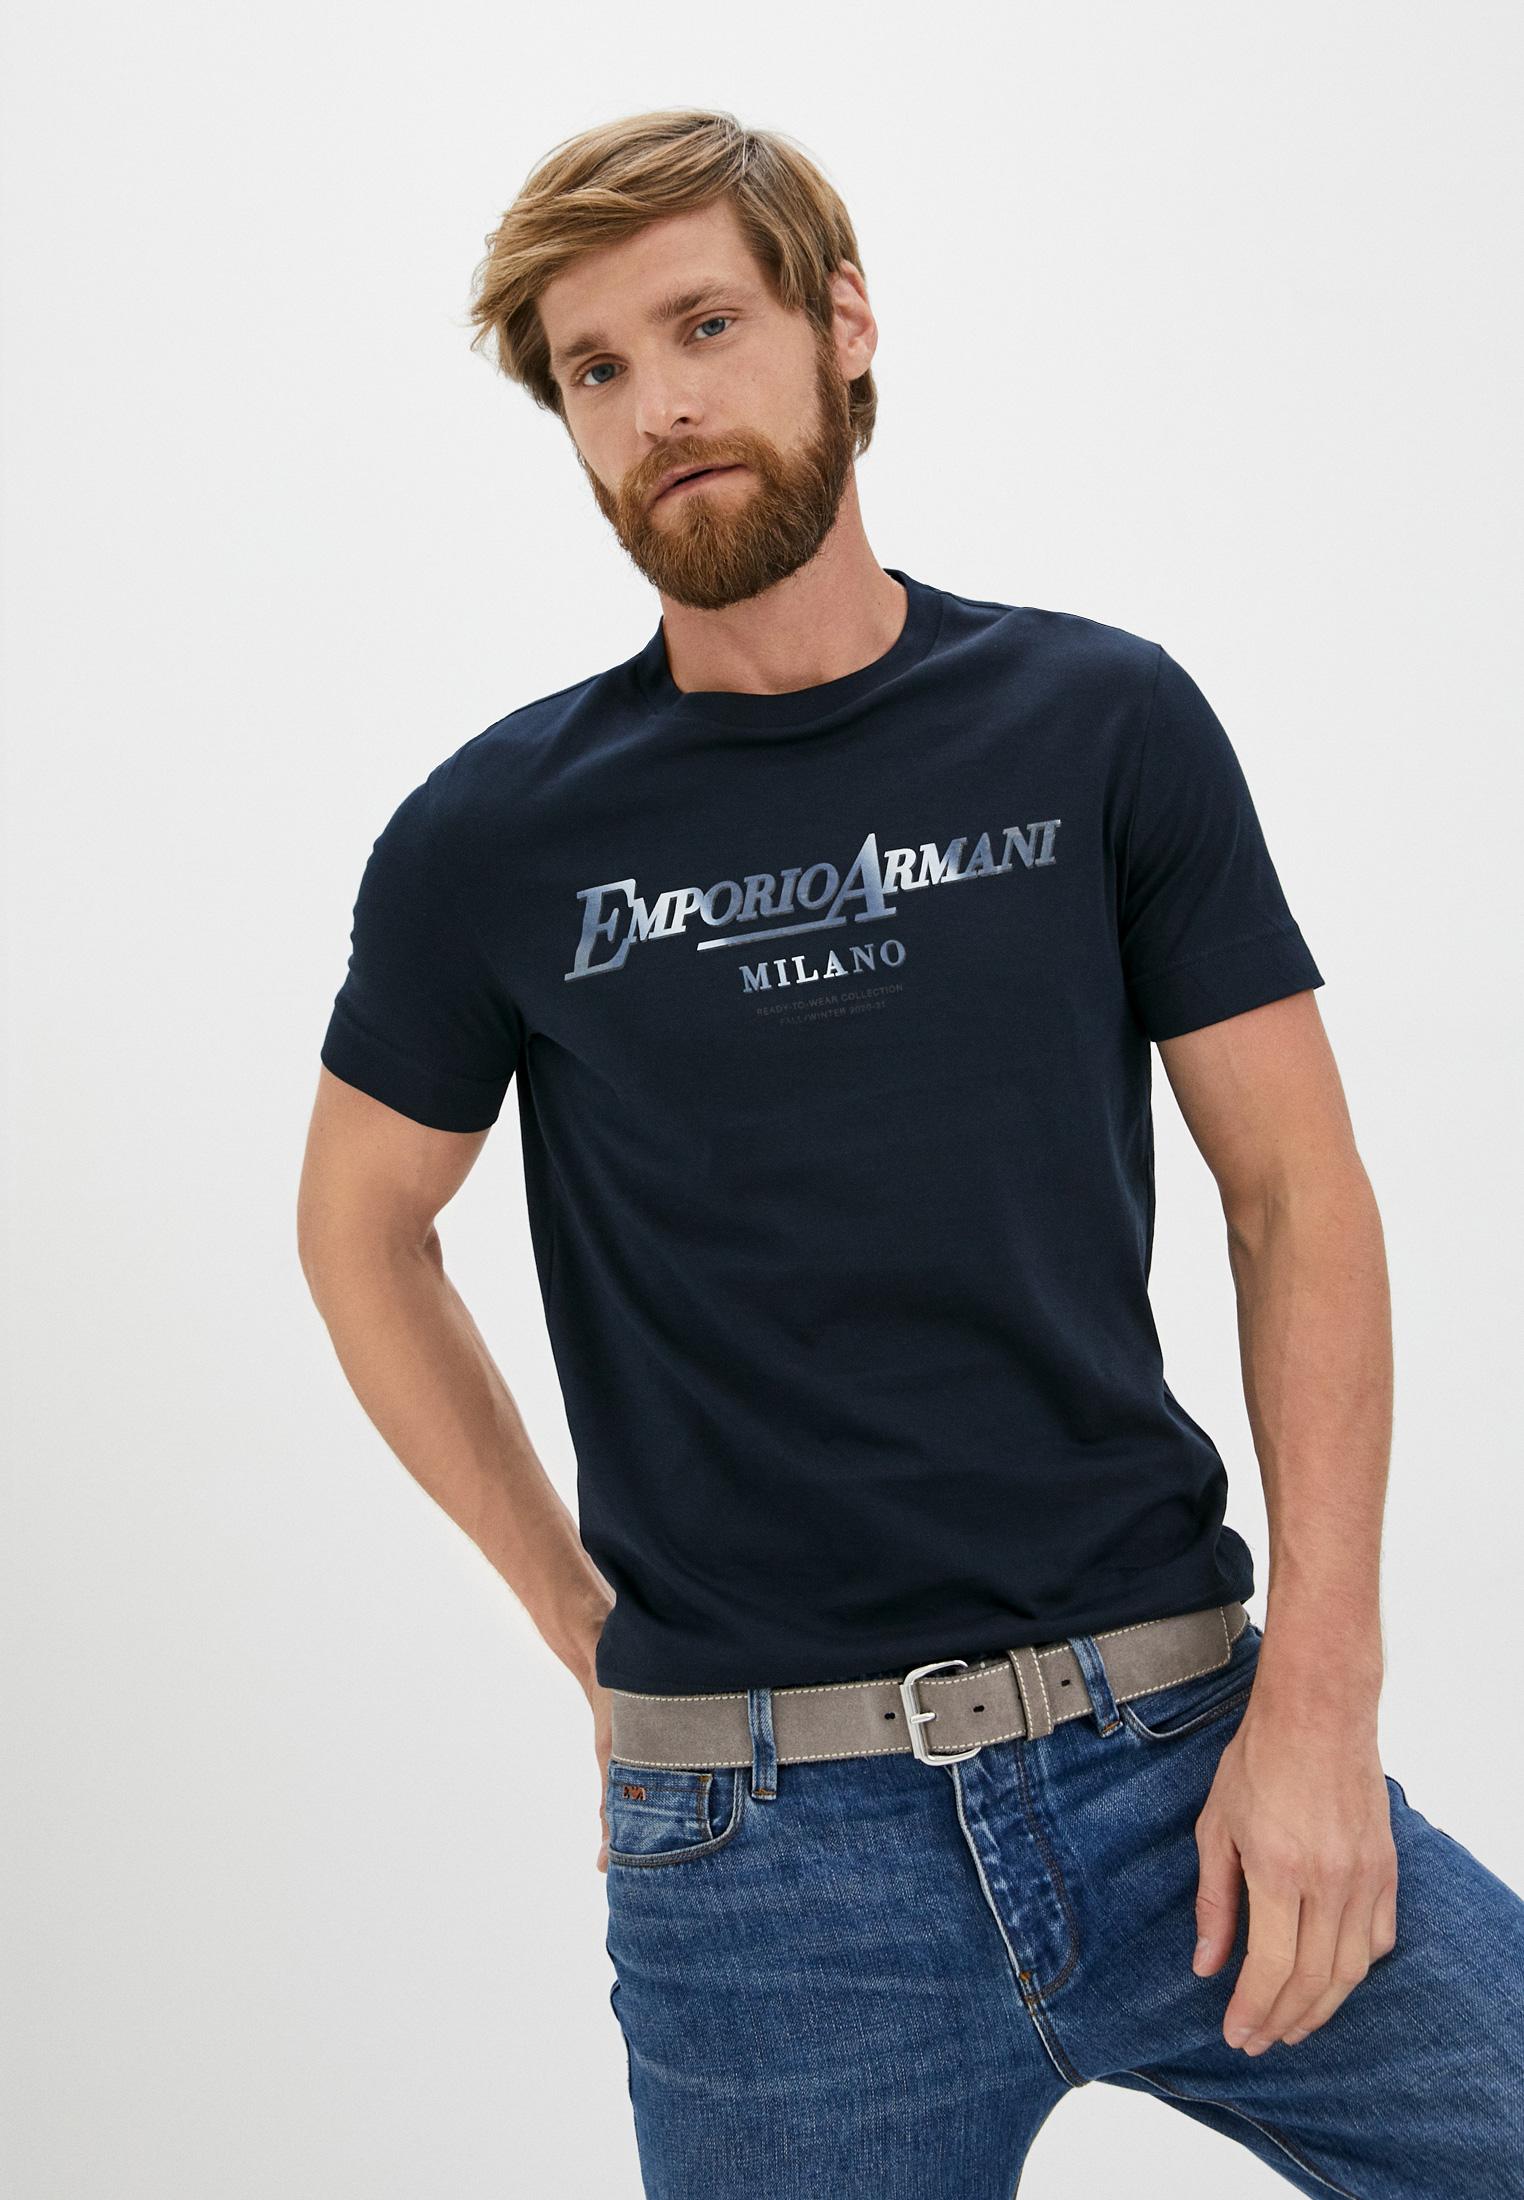 Мужская футболка Emporio Armani (Эмпорио Армани) 6h1tr7 1jshz